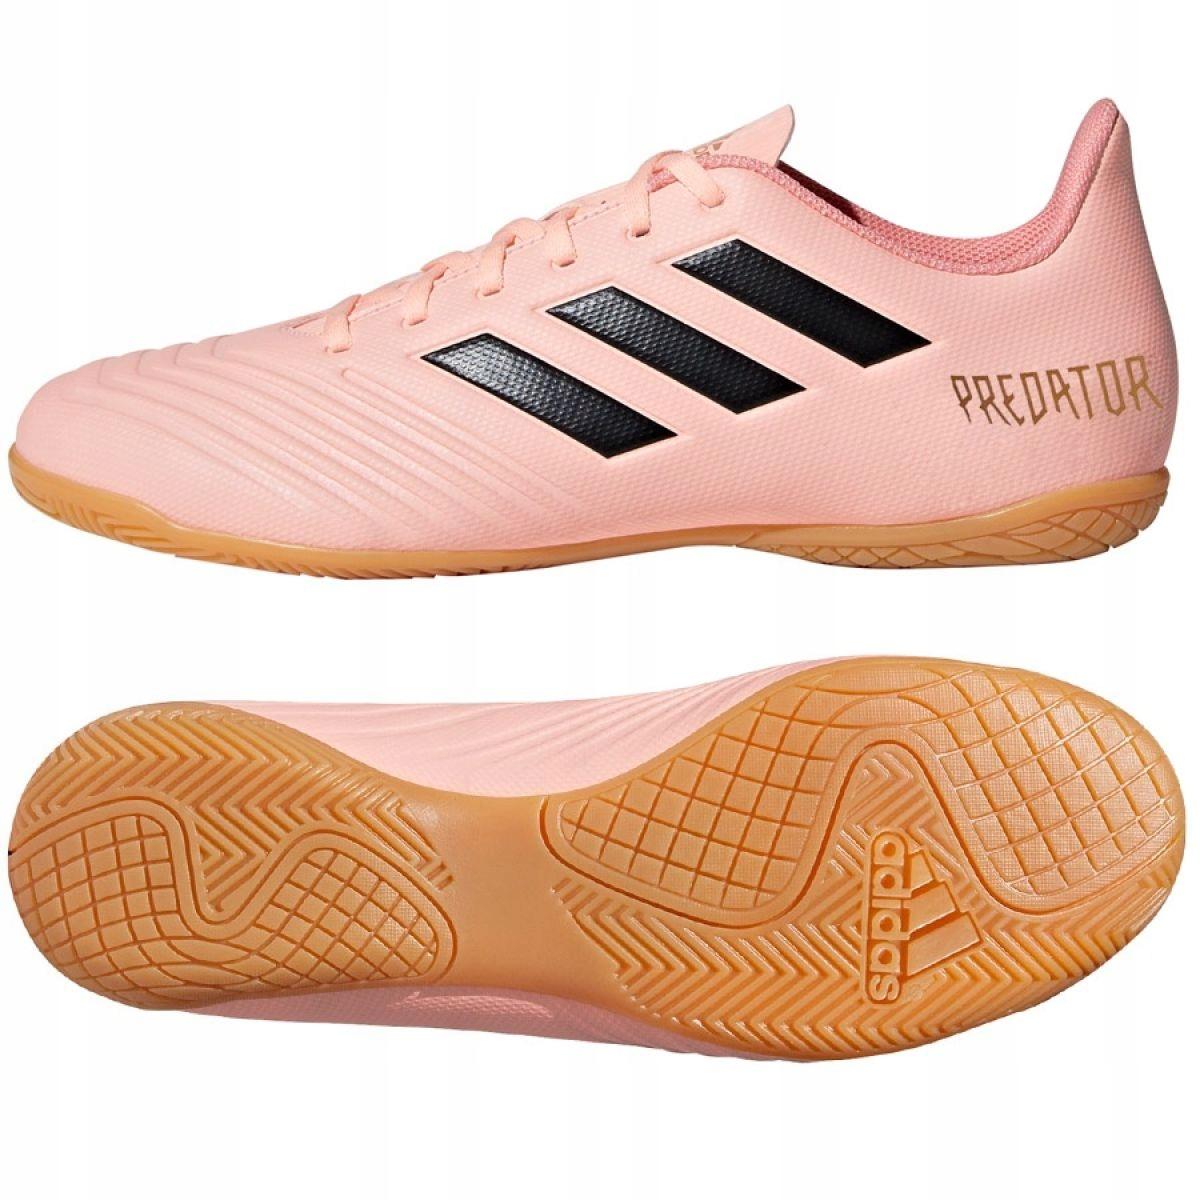 adidas buty halowe męskie nr 39 nemezis tango 18